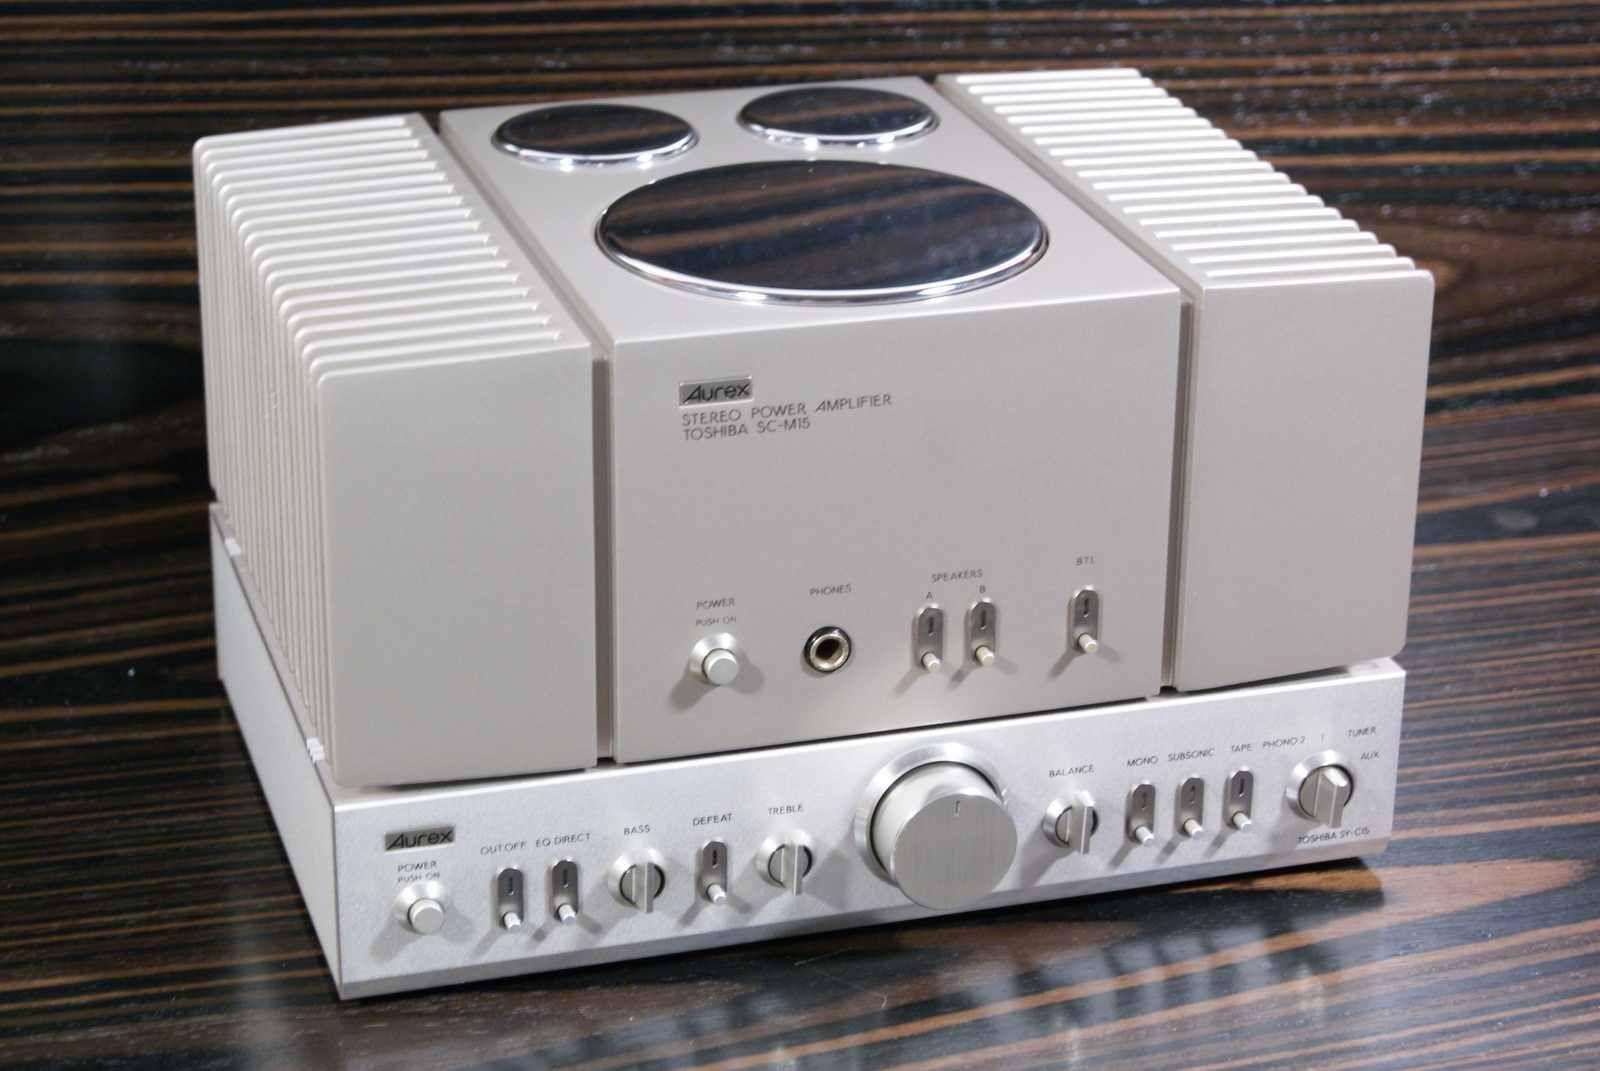 Toshiba SA-3500 Stereo Receiver ____ sn-03 560384 - YouTube